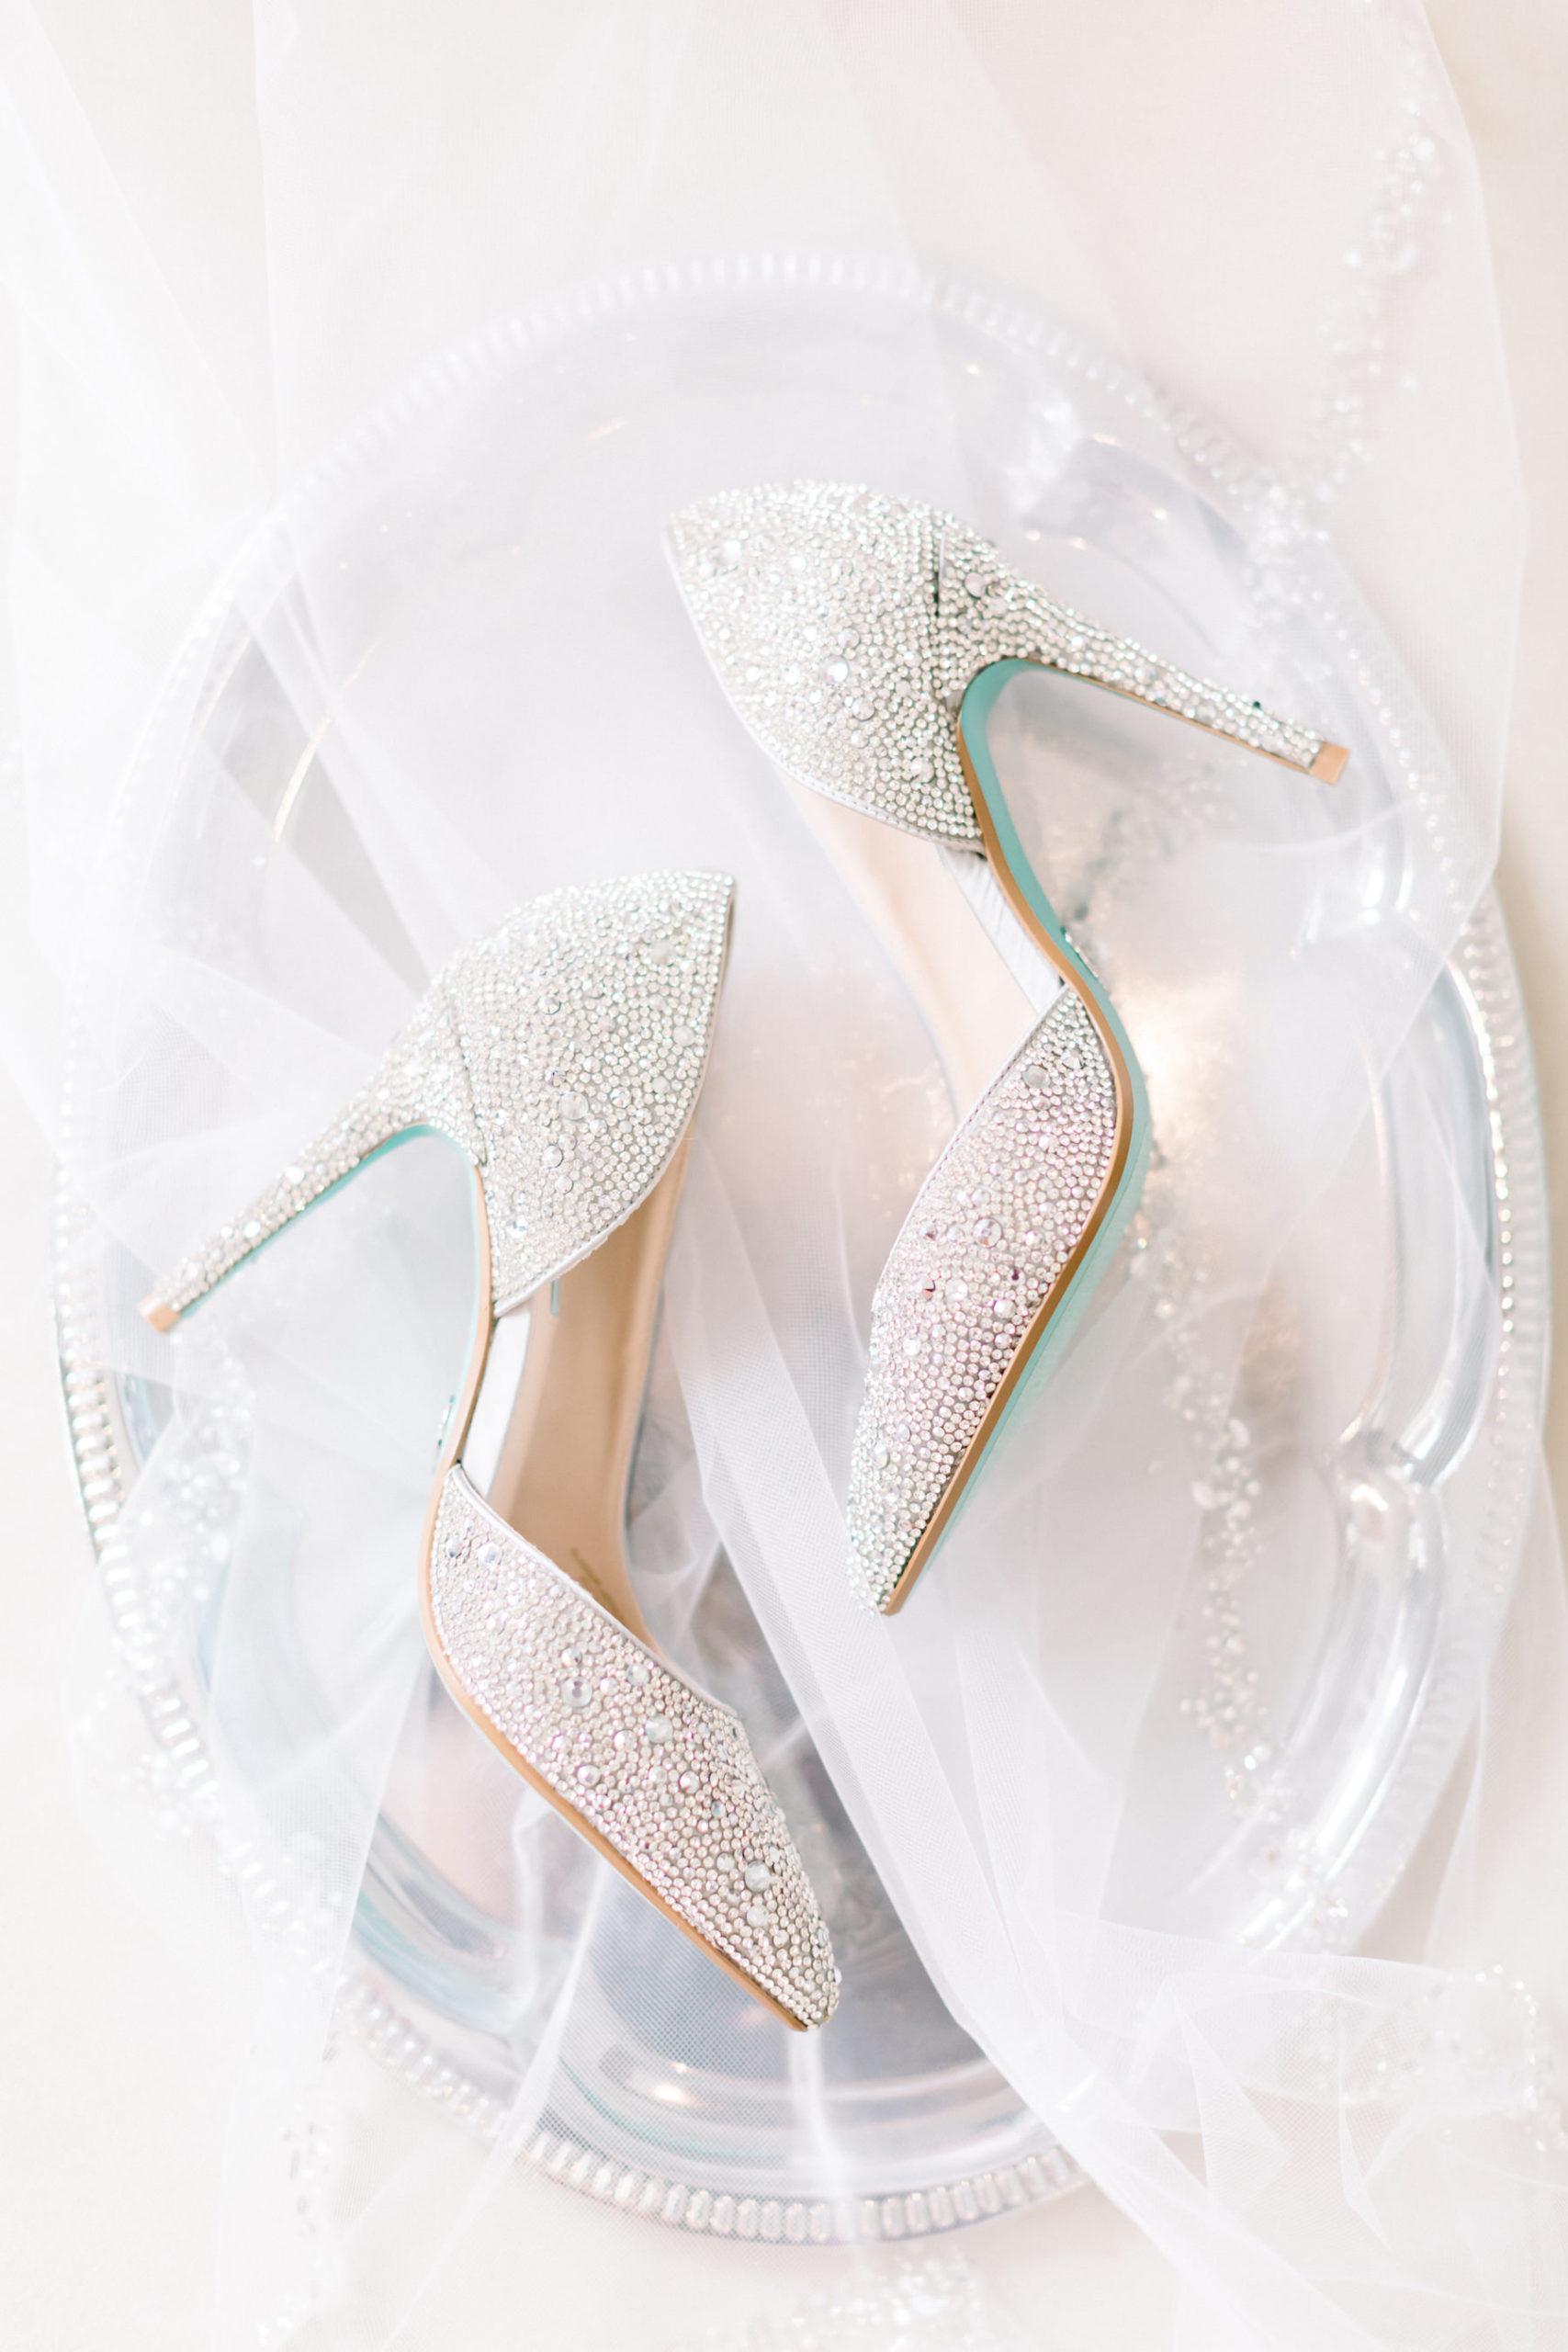 Bridal Rhinestone Pointed Toe with Blue Bottom Wedding Heel Shoes | Tampa Wedding Photographer Shauna and Jordon Photography